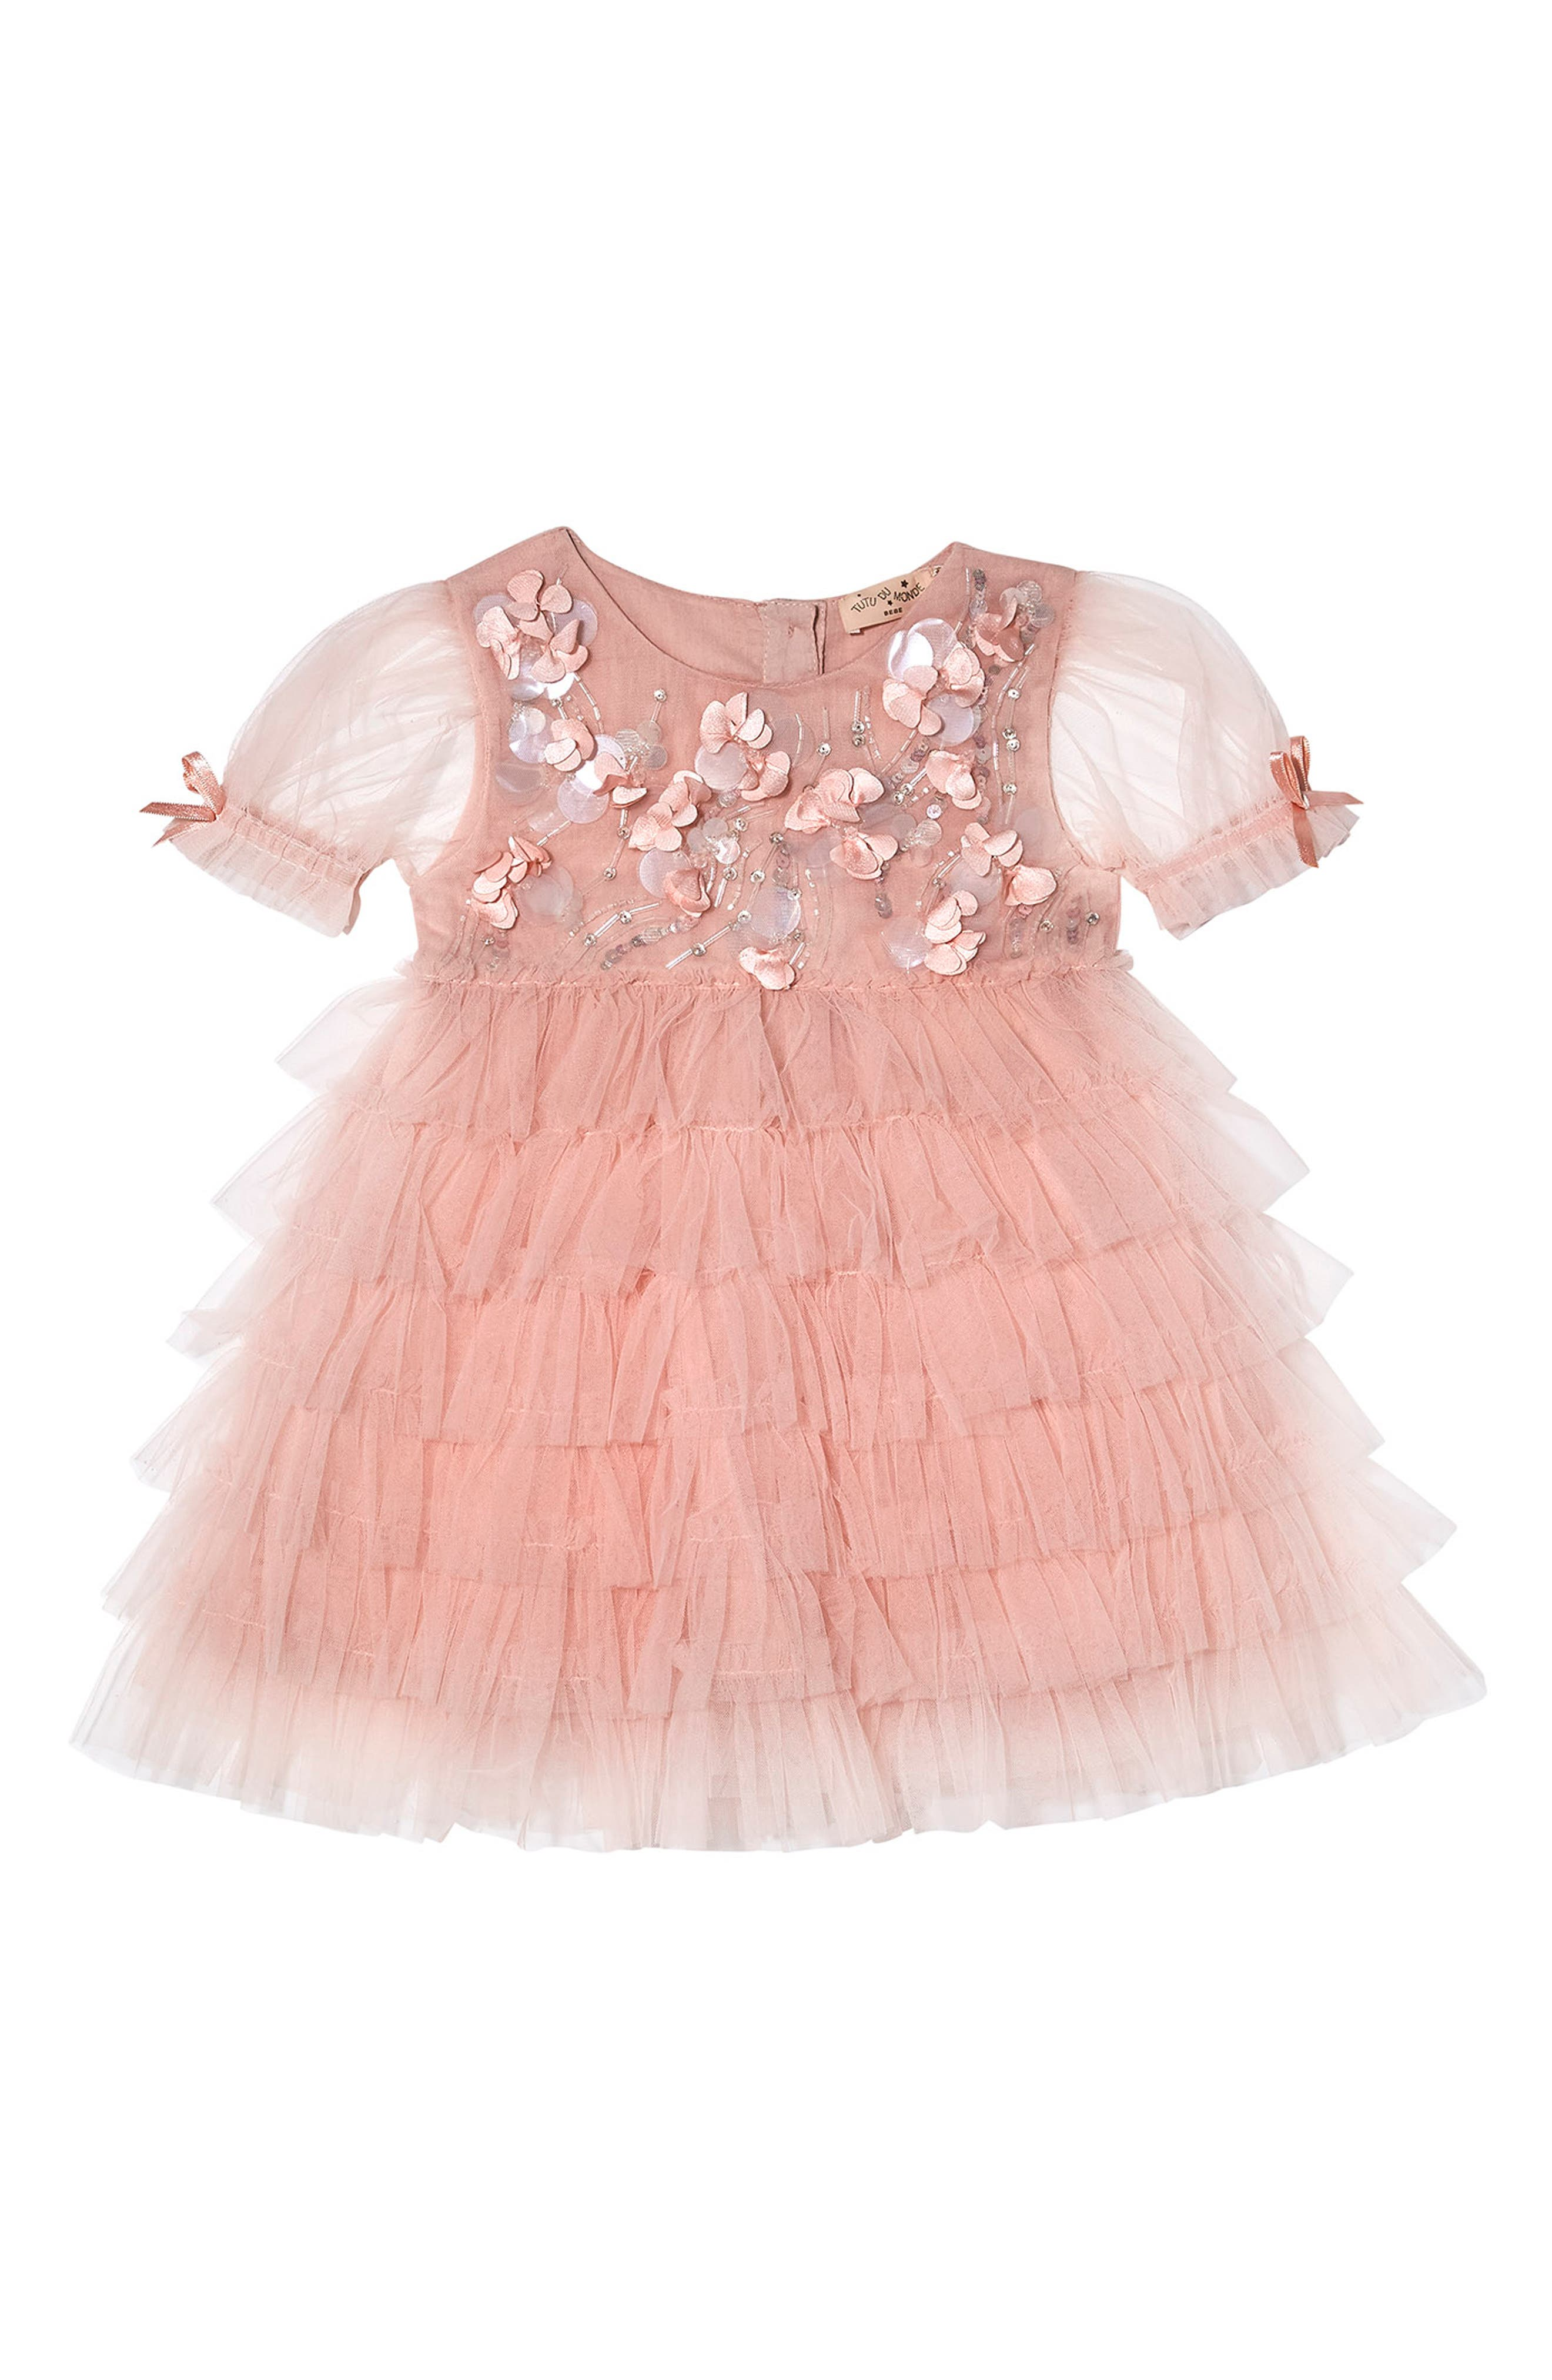 Strawberry Shortcake tutu Green tutu Green and Pink tutu Pink tutu Lilly Pulitzer Inspired tutu strawberry Shortcake Costume